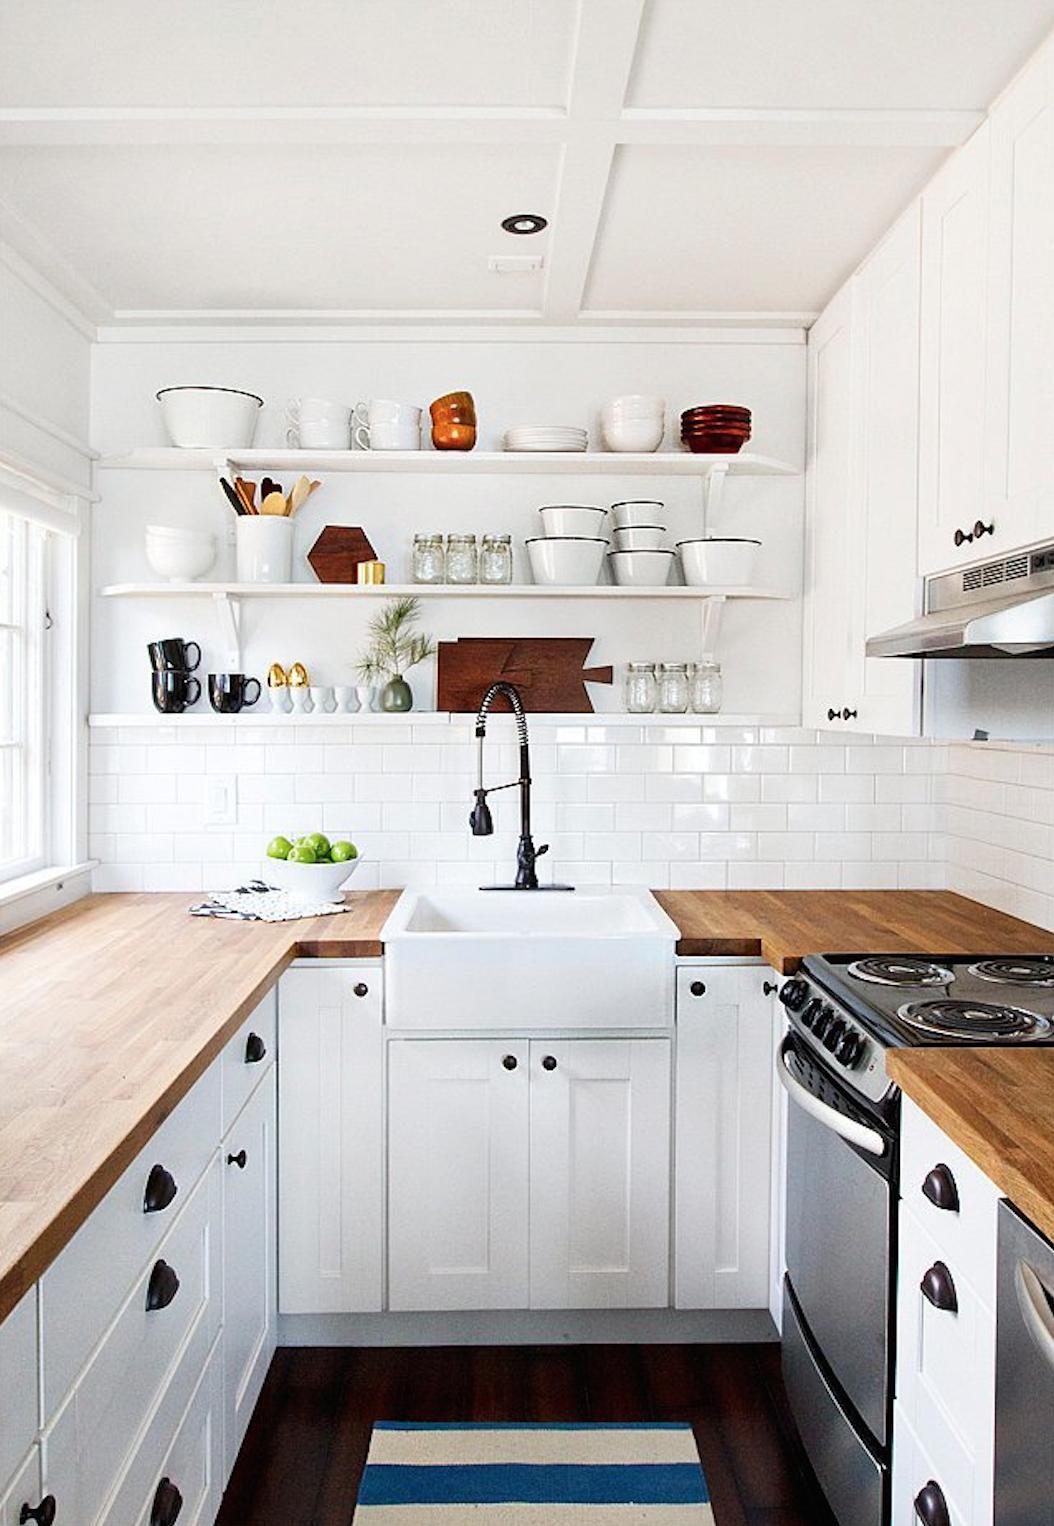 In her cabin kitchen, Sarah Samuel ofSmitten Studioinstalled Ikea&#8